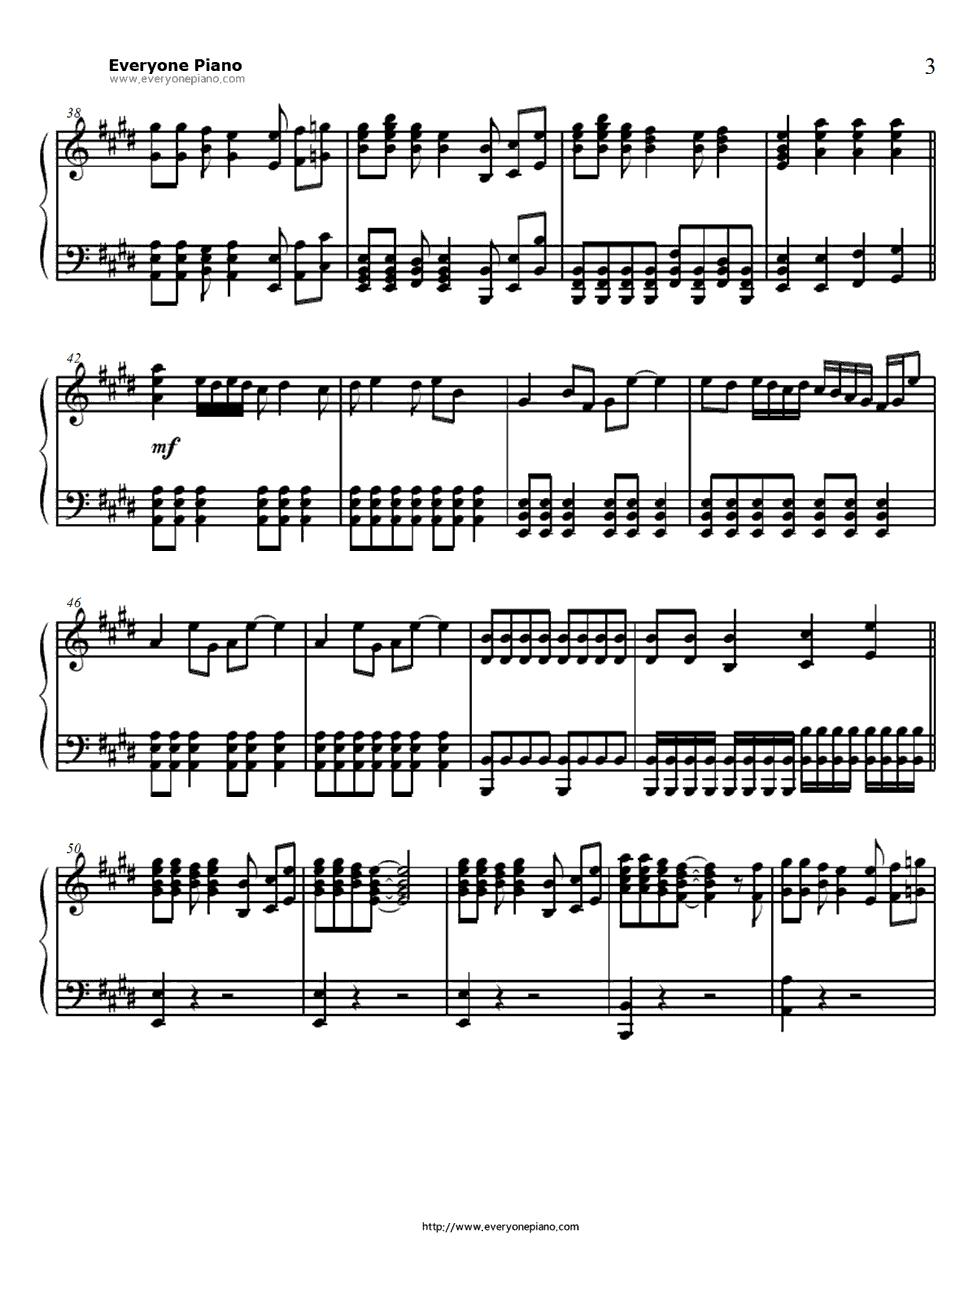 My chemical romance black parade piano chords piano ideas the end my chemical romance piano chords ideas hexwebz Choice Image